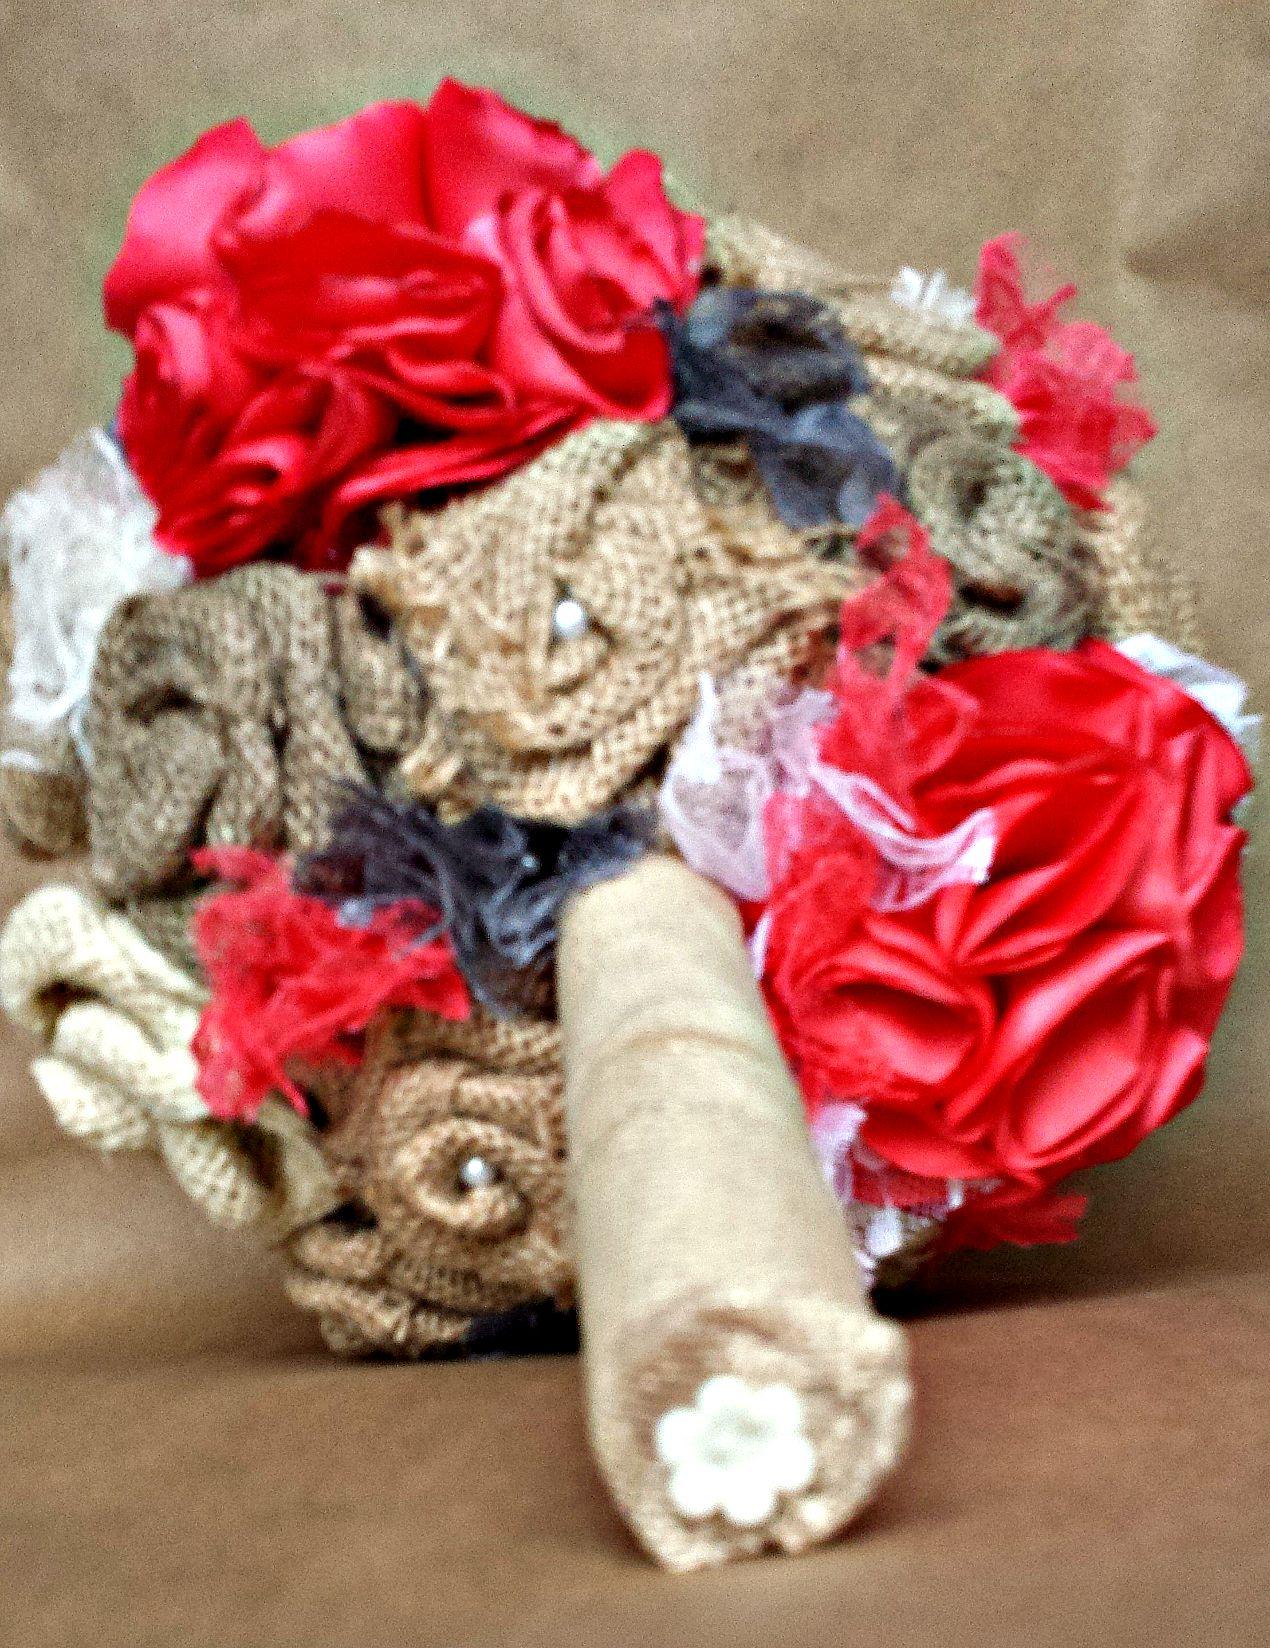 Diy fabric flower bouquet using burlap and satin fabric flower bouquet 5 izmirmasajfo